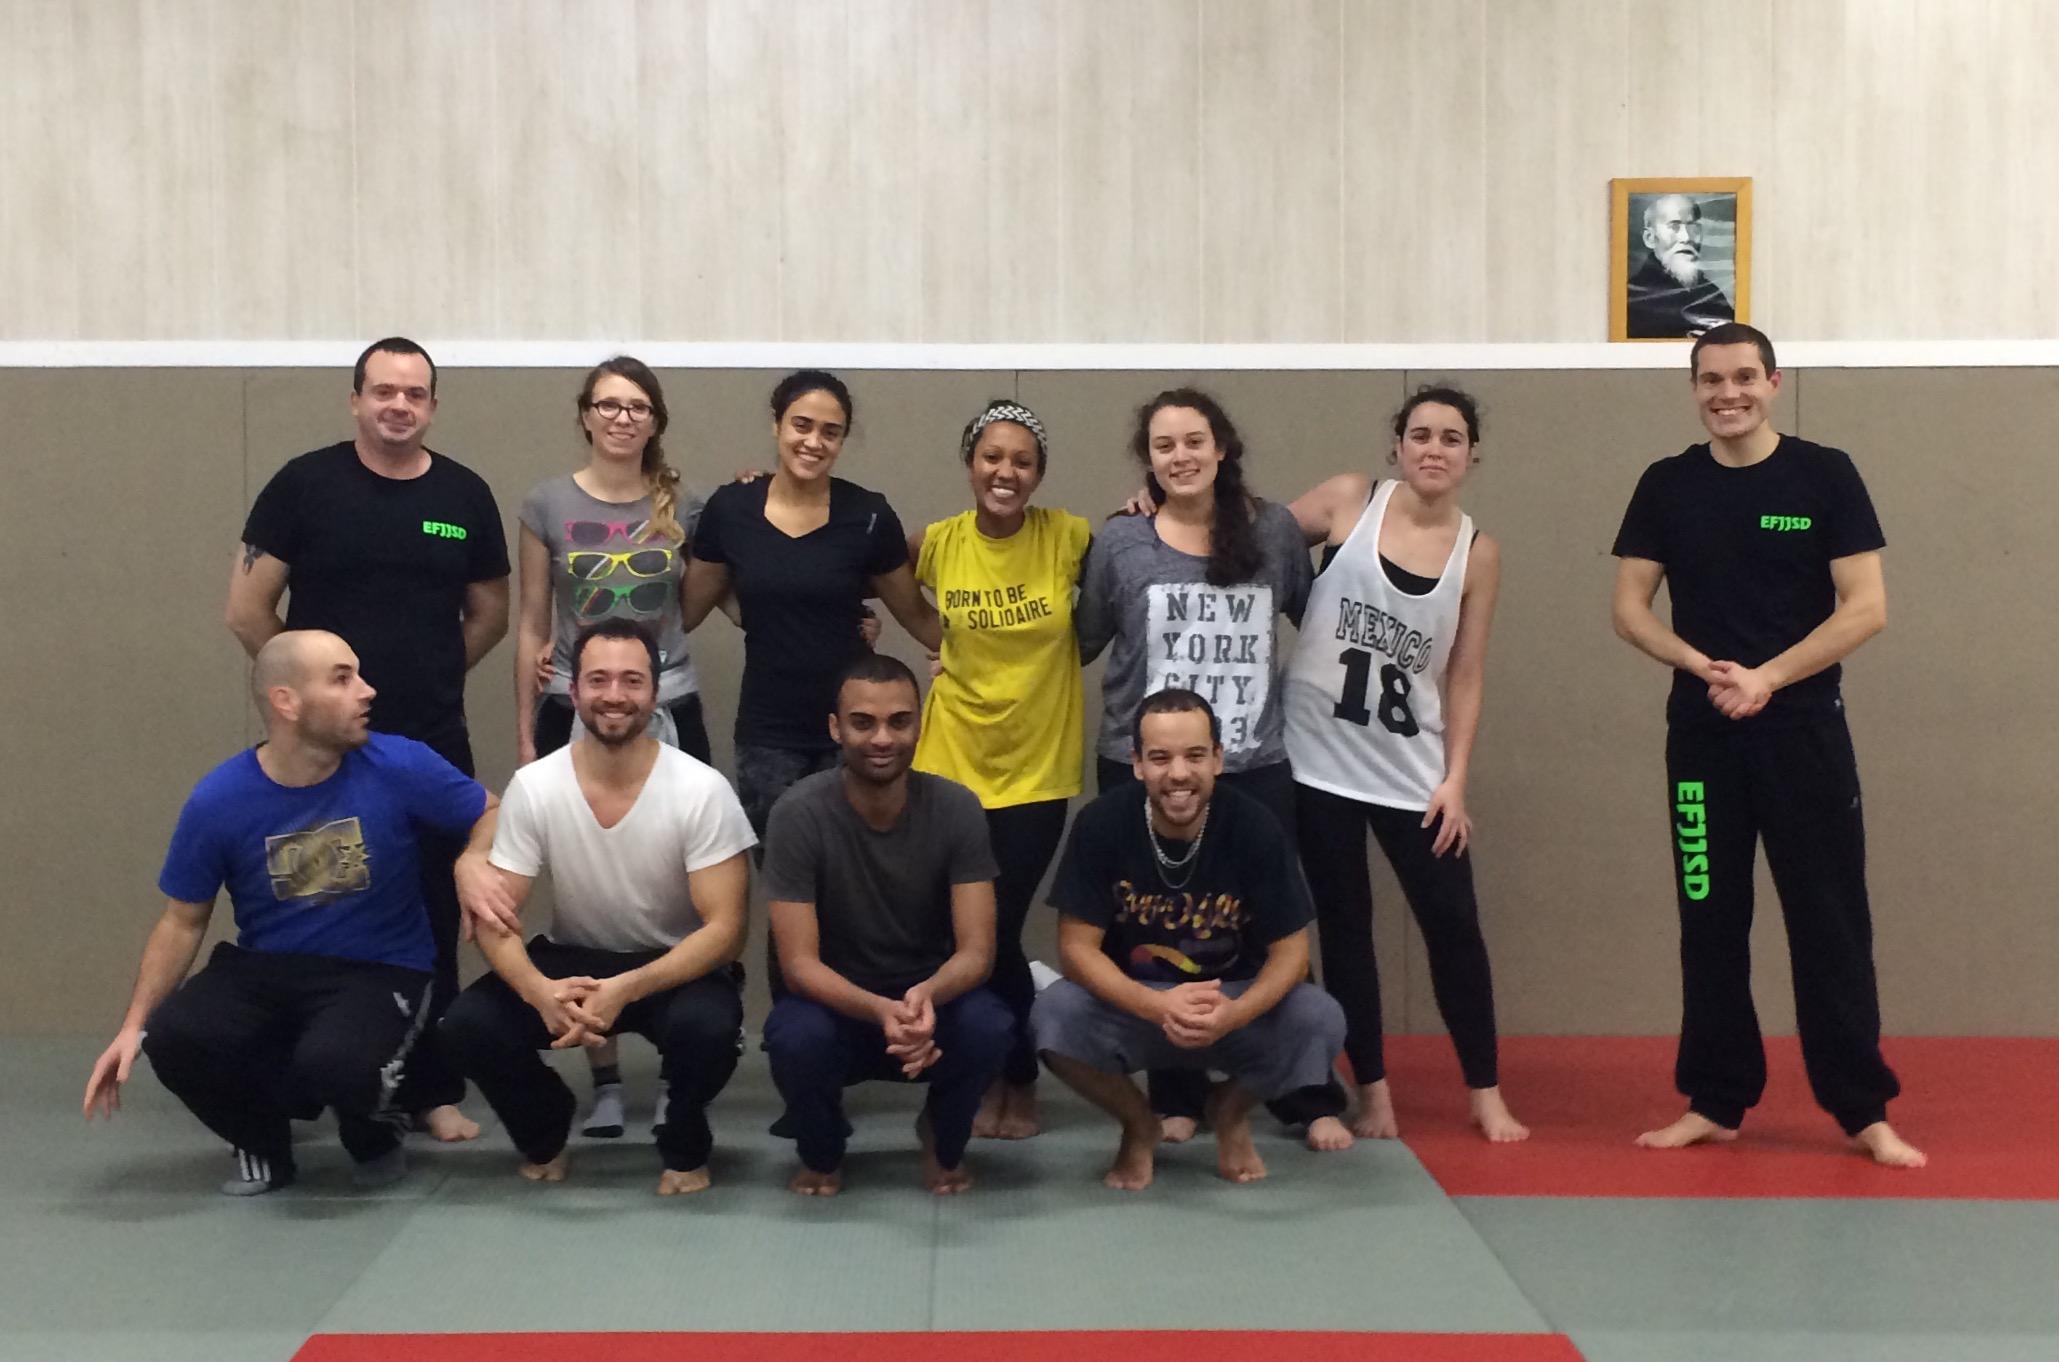 efjjsd-stage-self-defense-du-13-decembre-2015